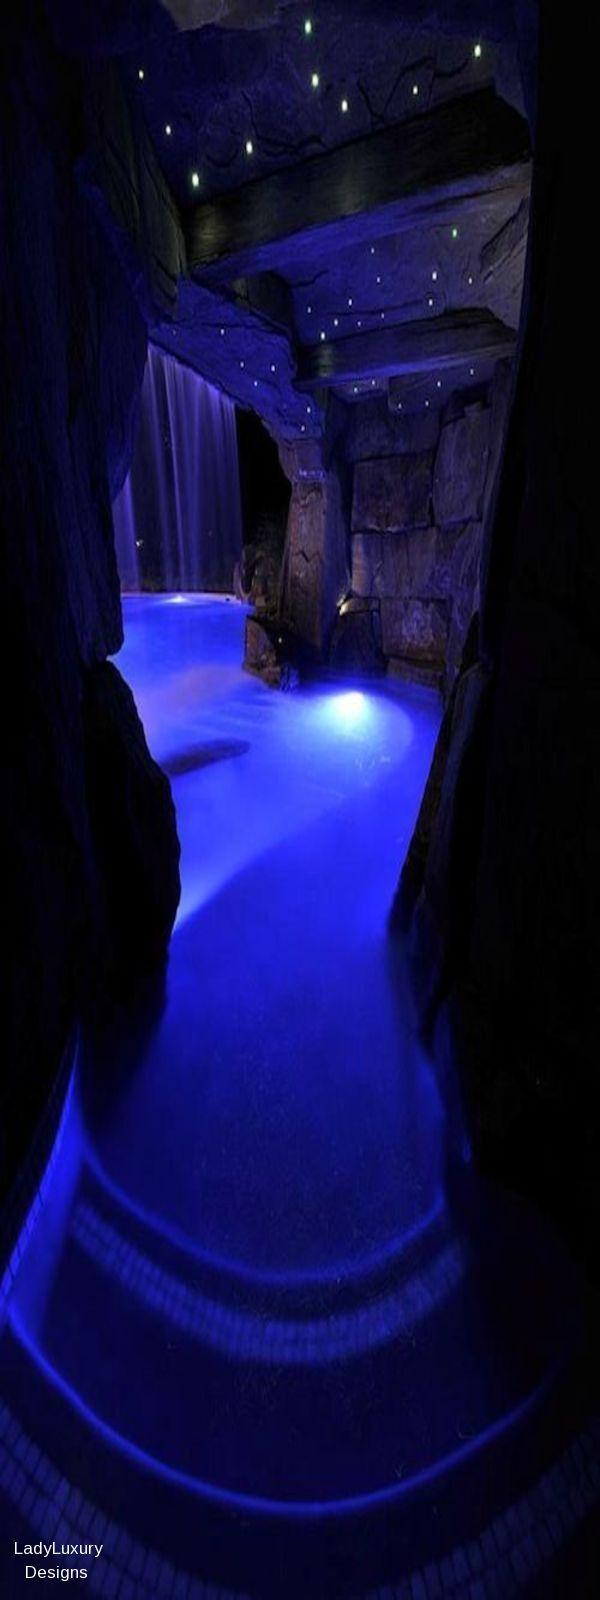 Million Dollar Interiors- Indoor Pool | LadyLuxuryDesigns